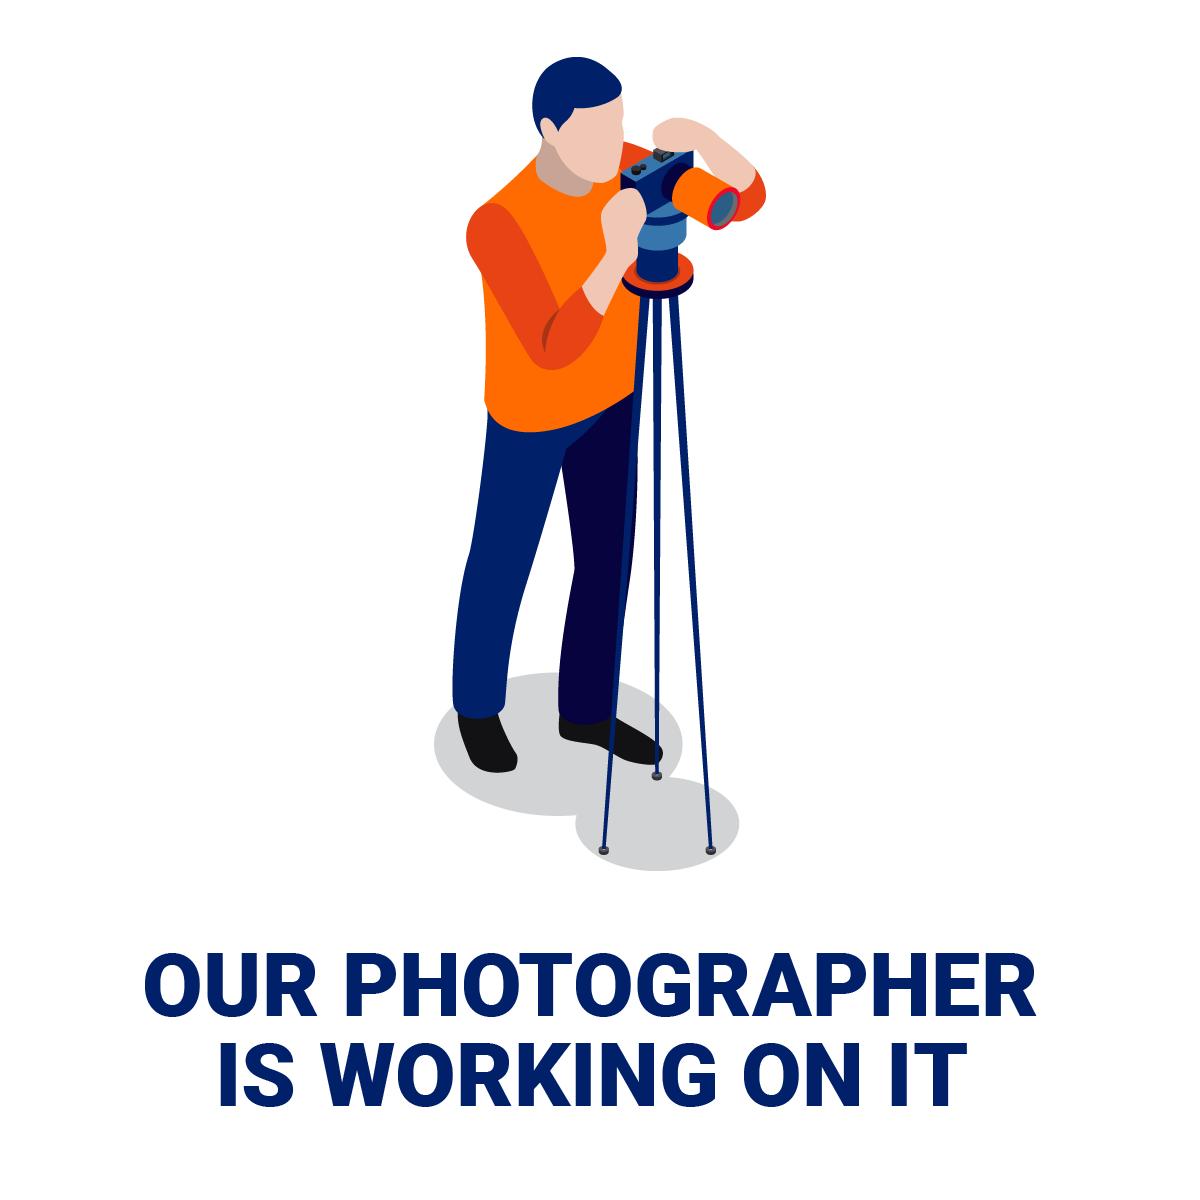 Dell PowerEdge R640 Diskless 1U Rack Server - Configure Your Own